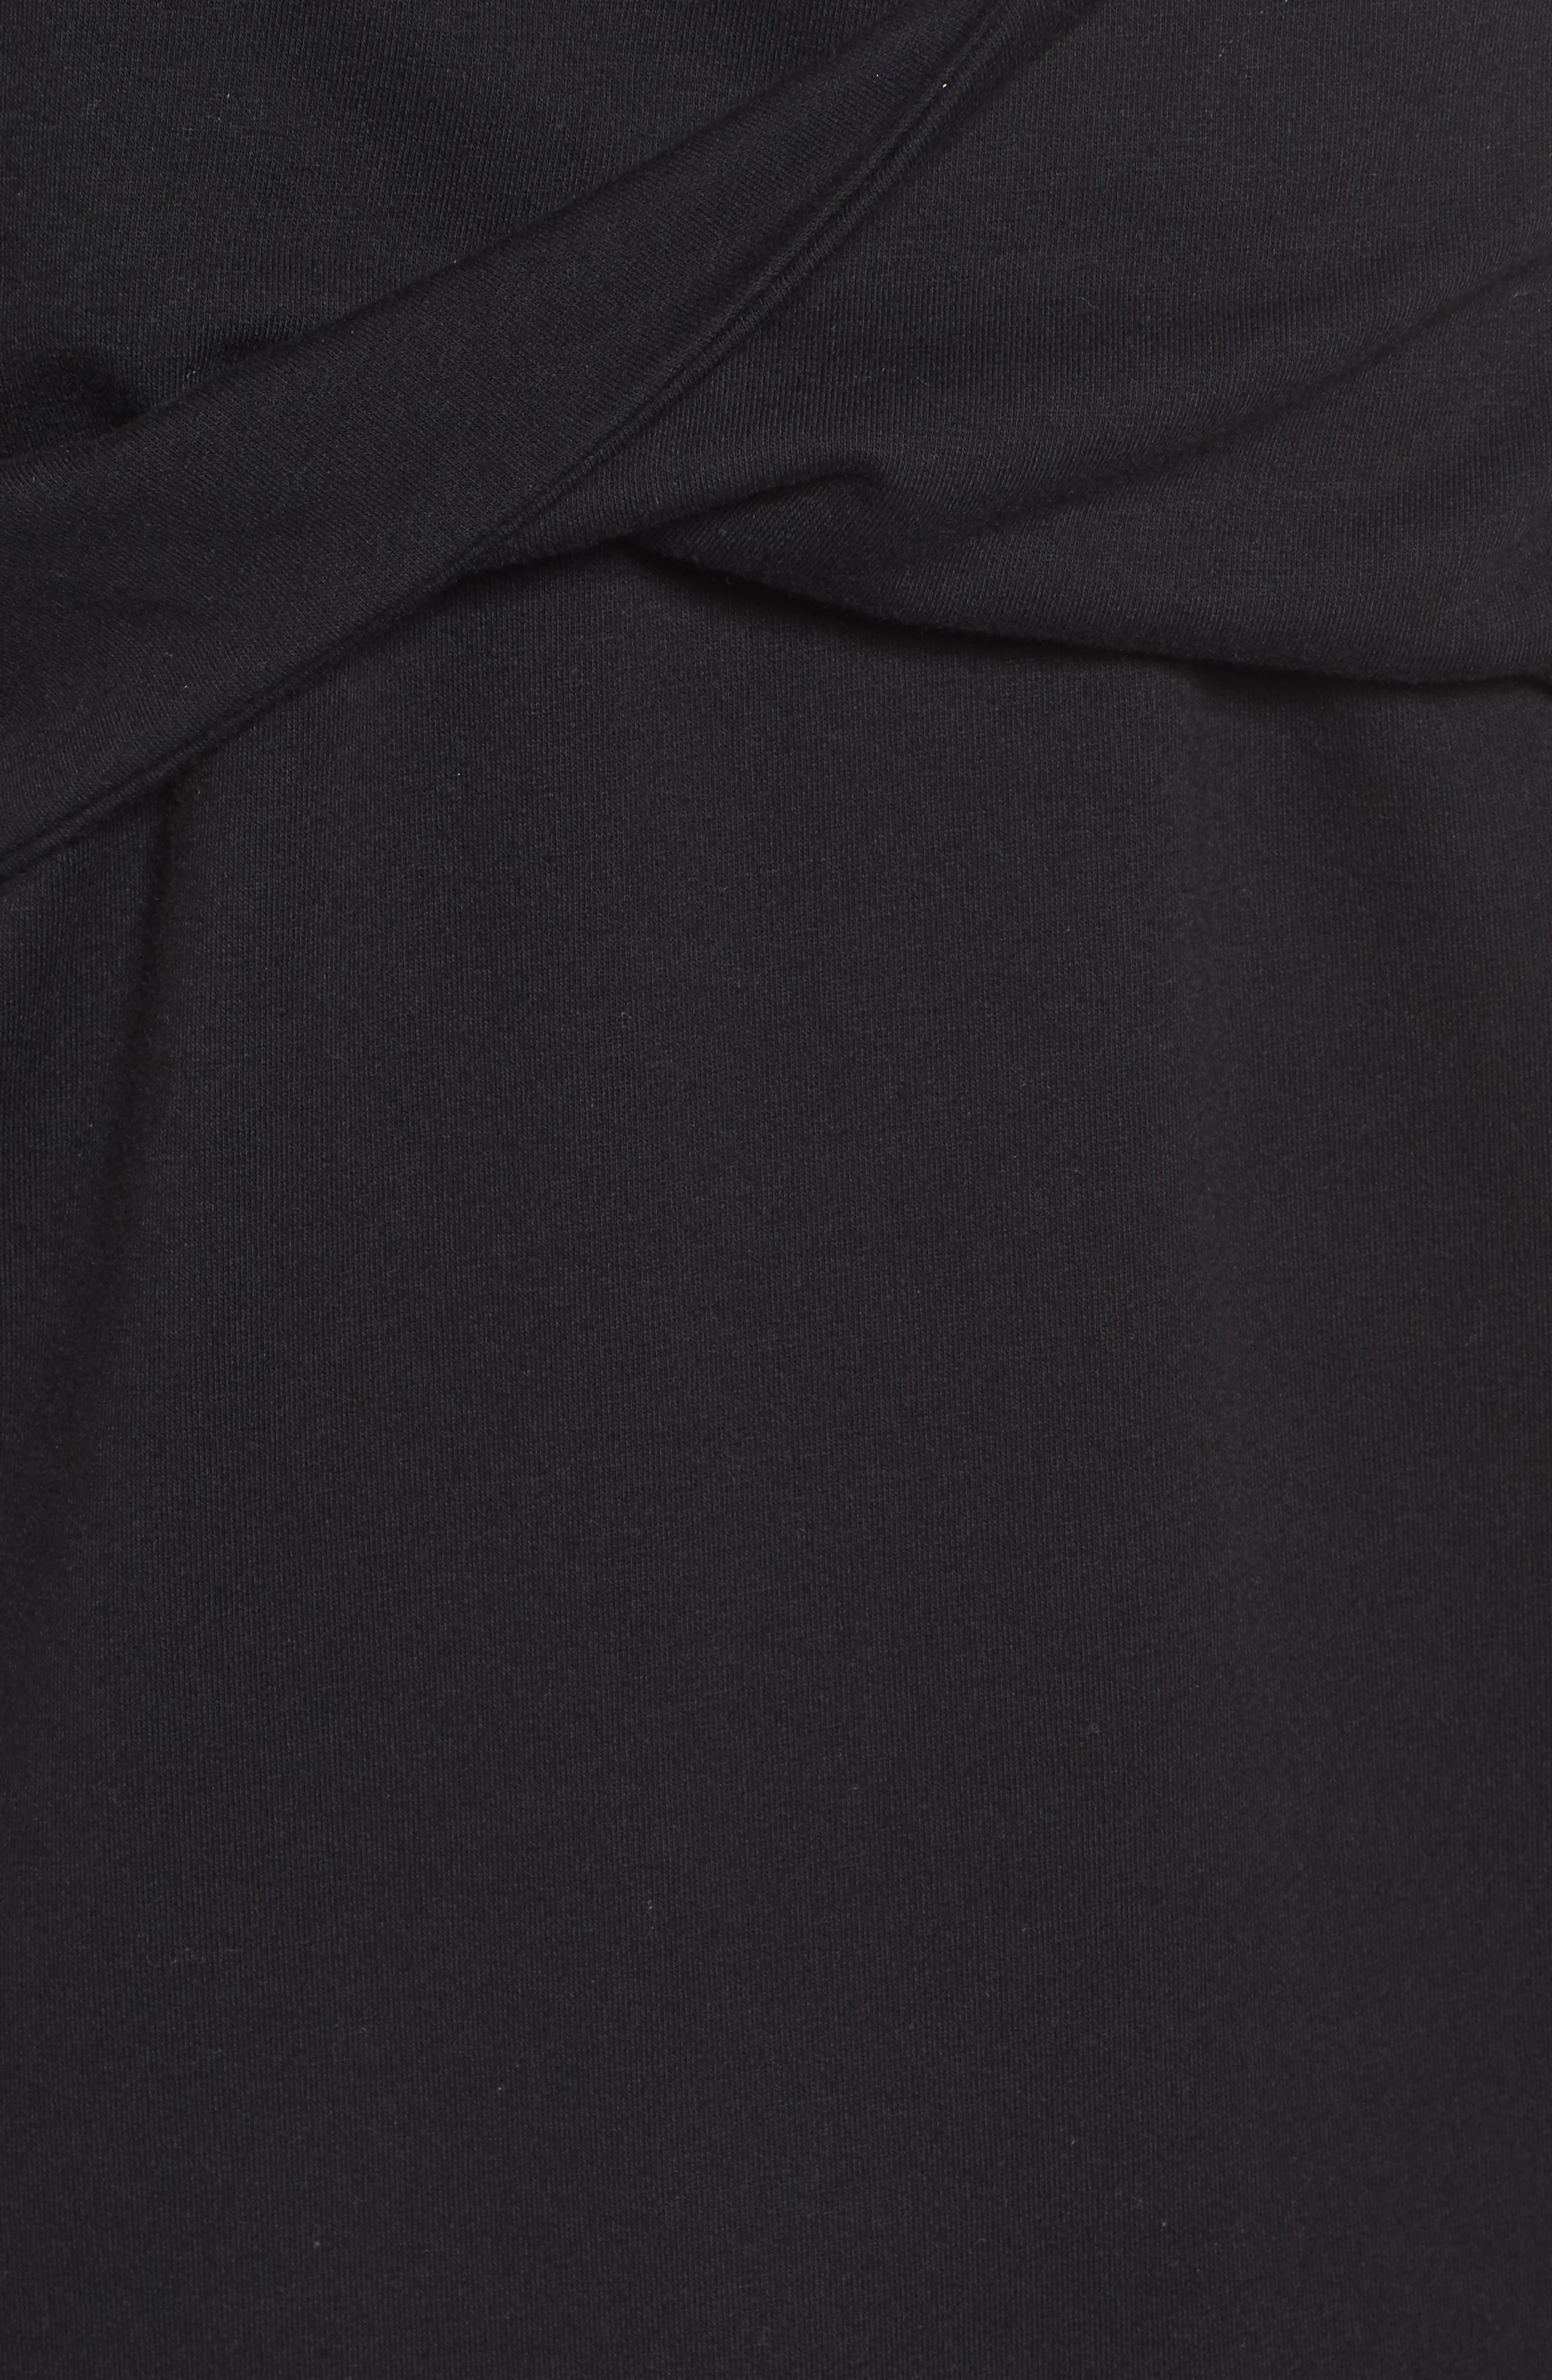 Twist Front Sweatshirt,                             Alternate thumbnail 5, color,                             Black